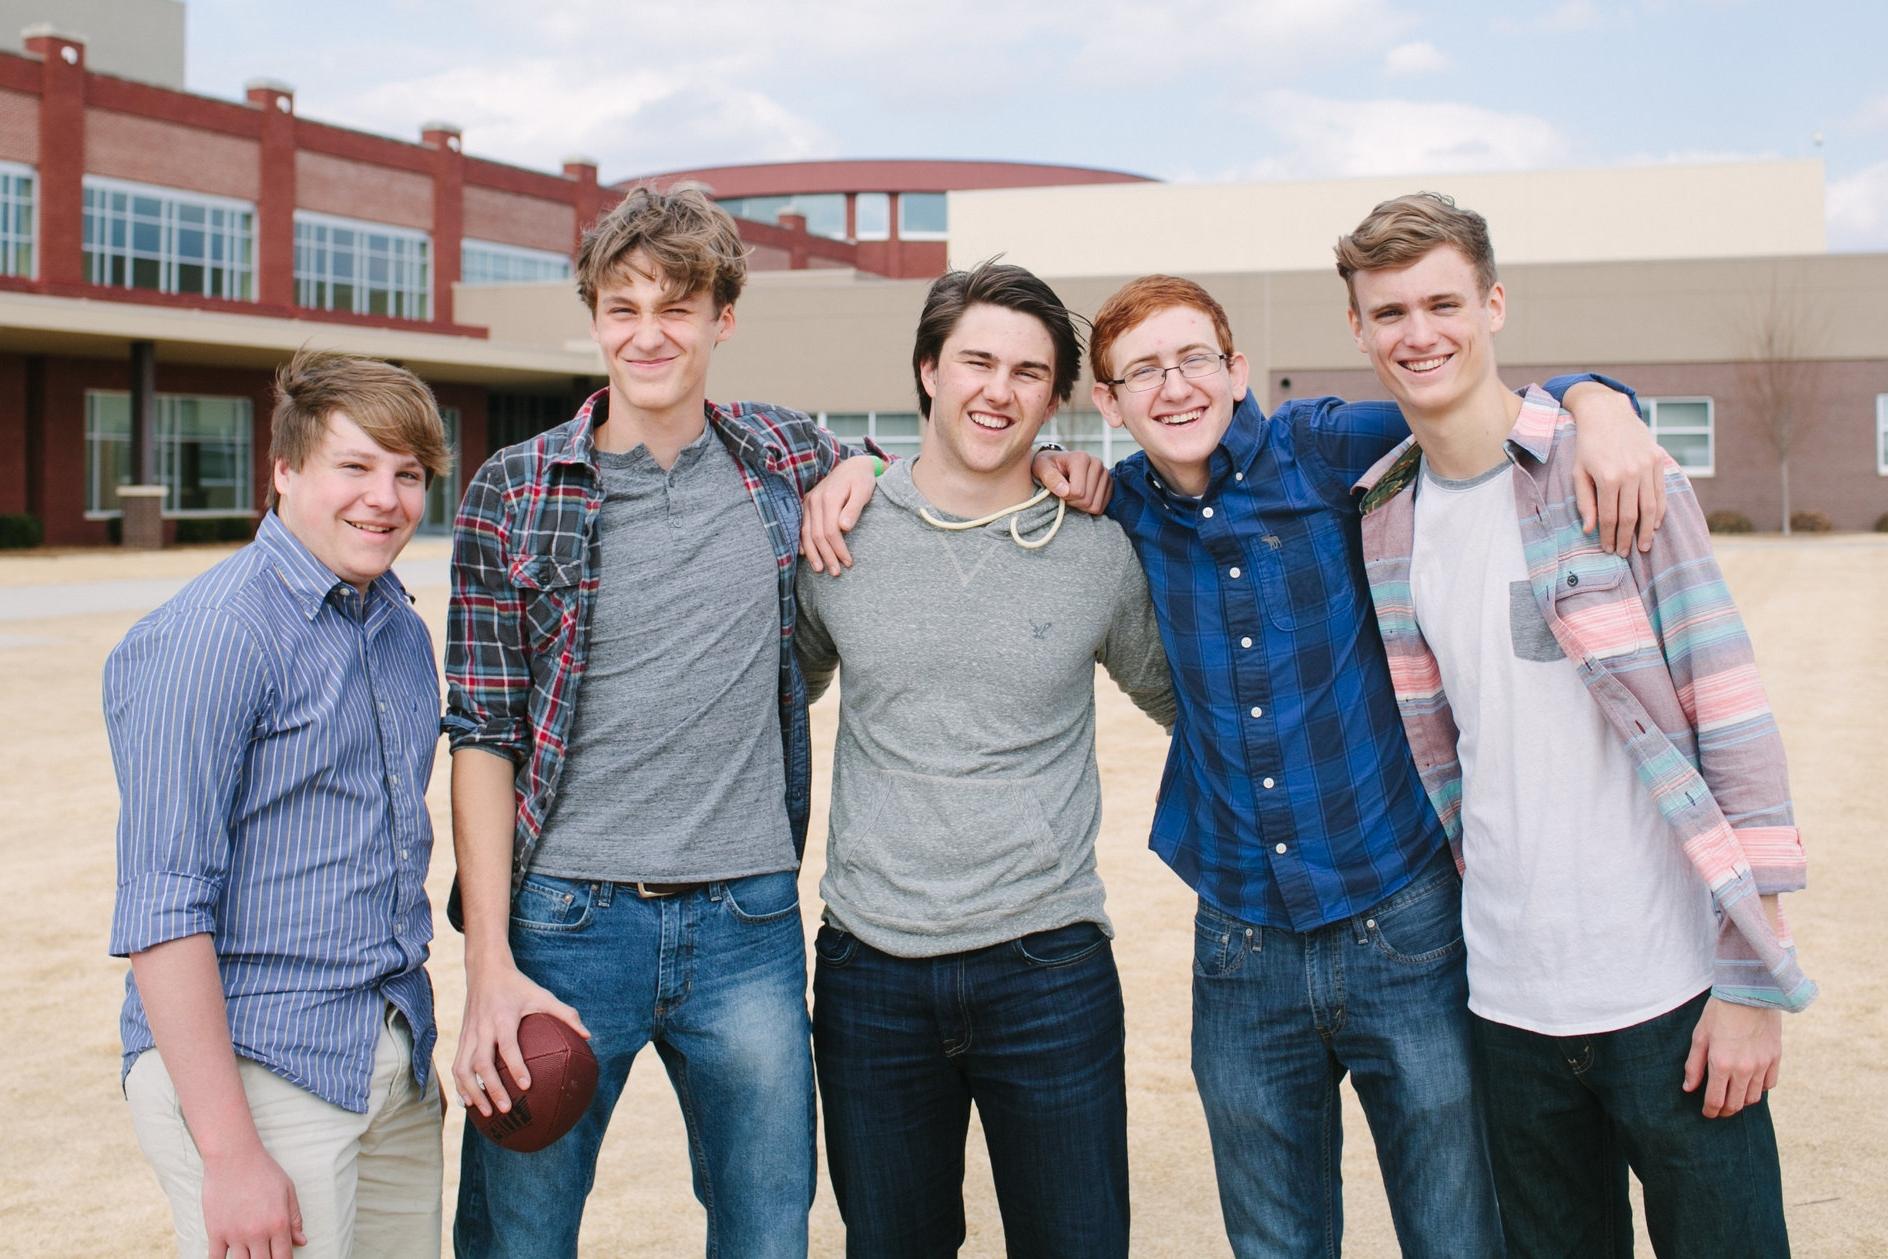 Students - 6th - 12th Grade